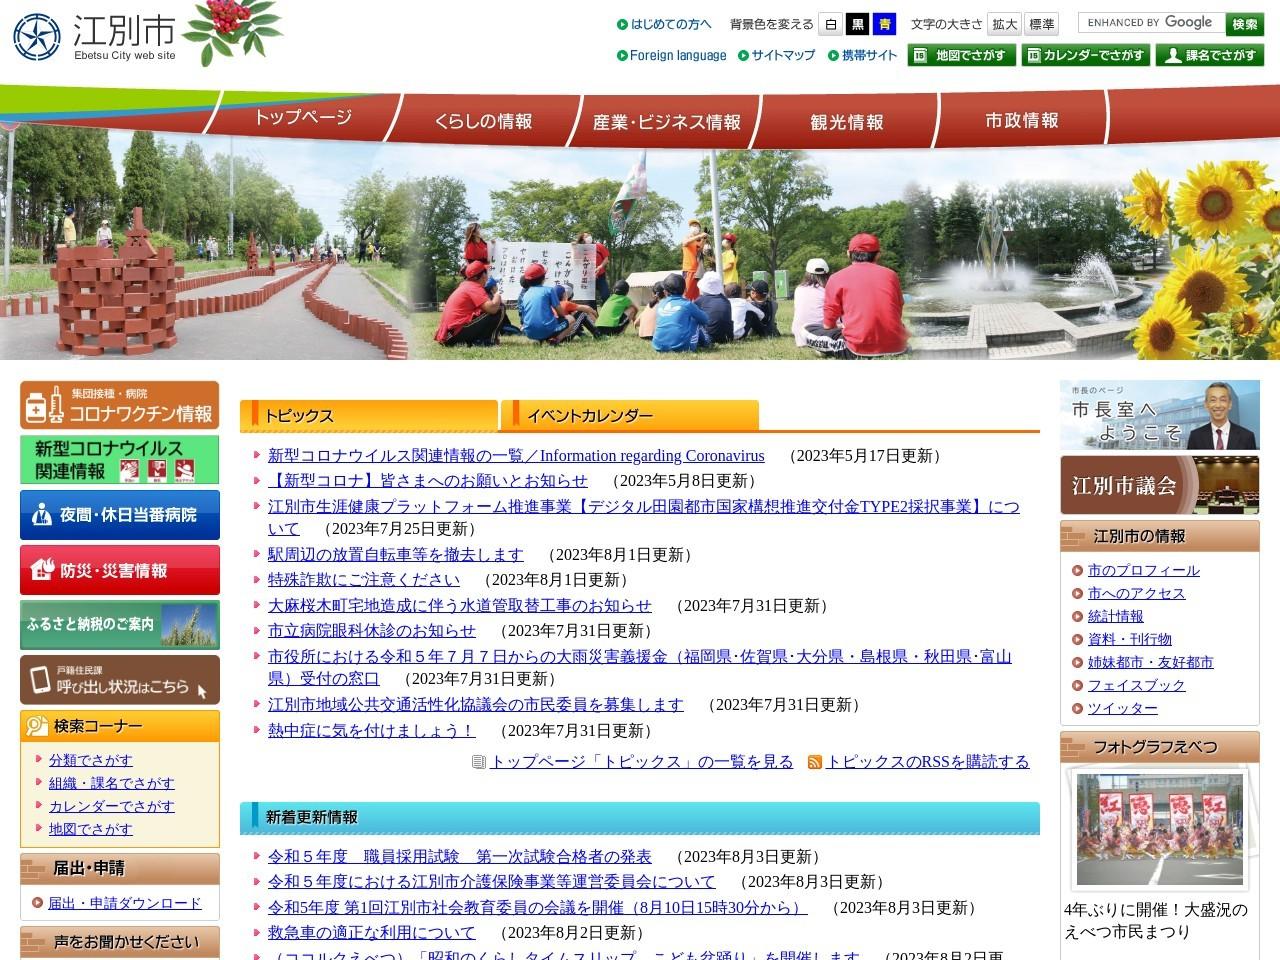 http://www.city.ebetsu.hokkaido.jp/site/ceramic/52907.html